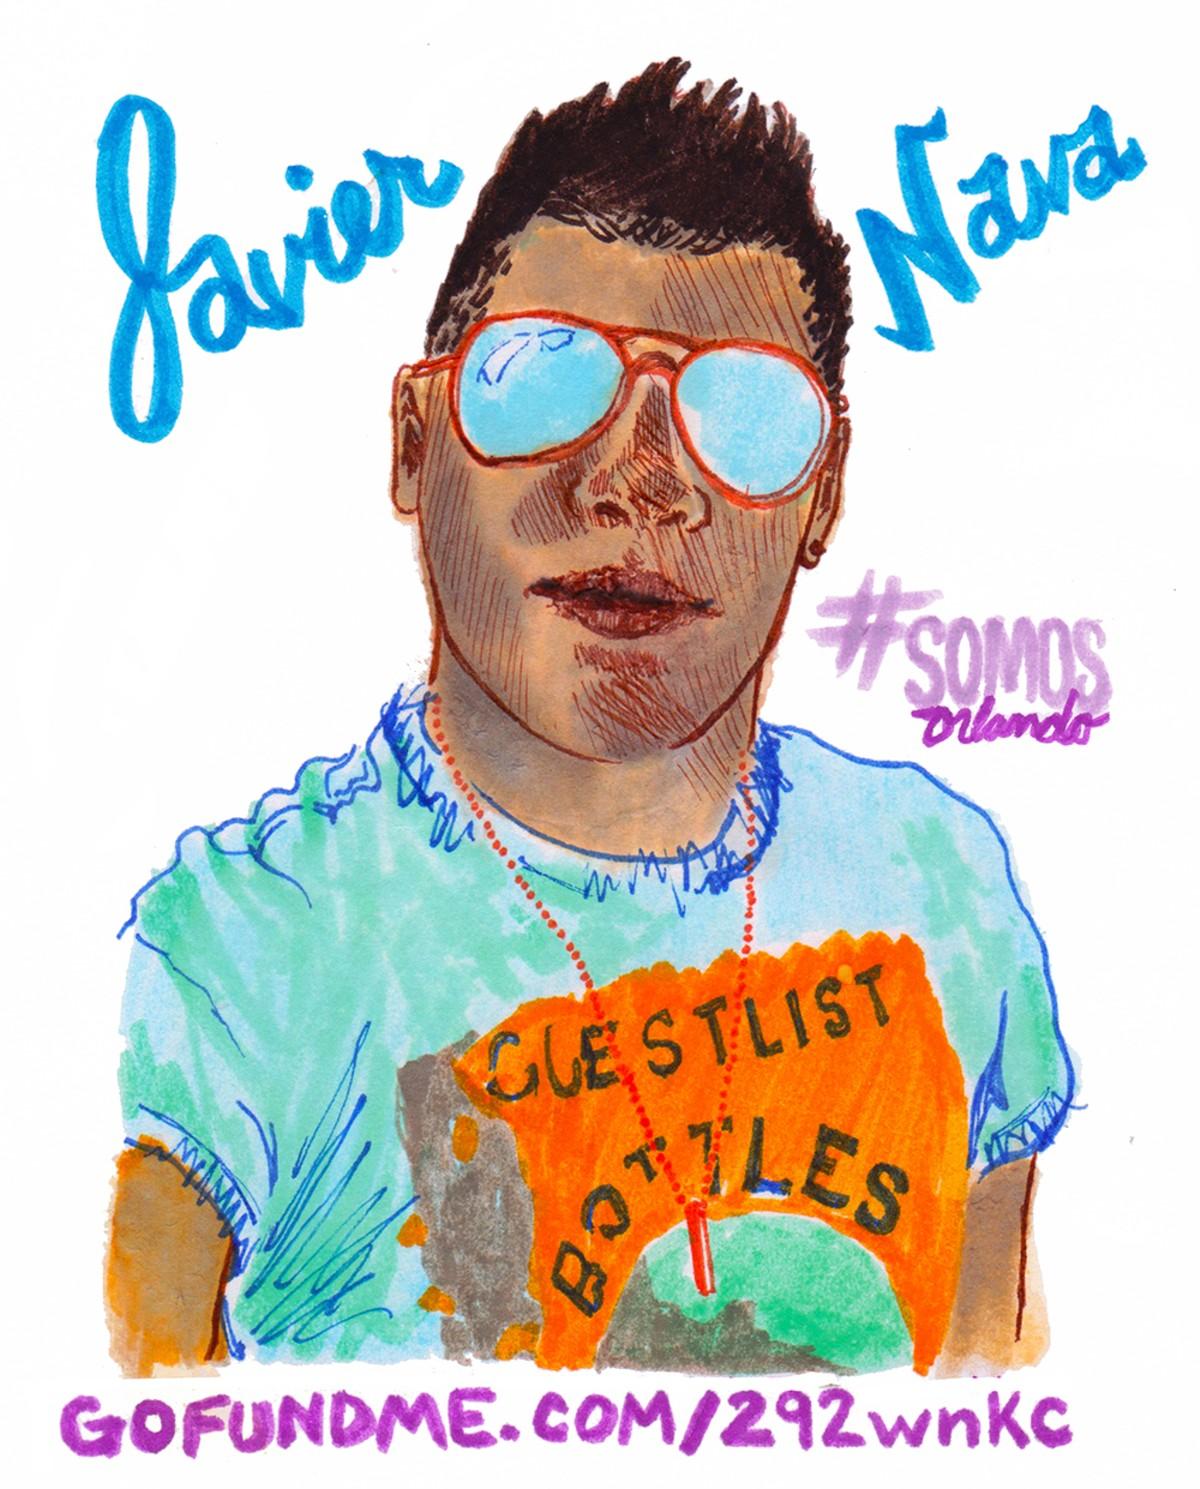 AdoptOrlando portrait of Javier Nava